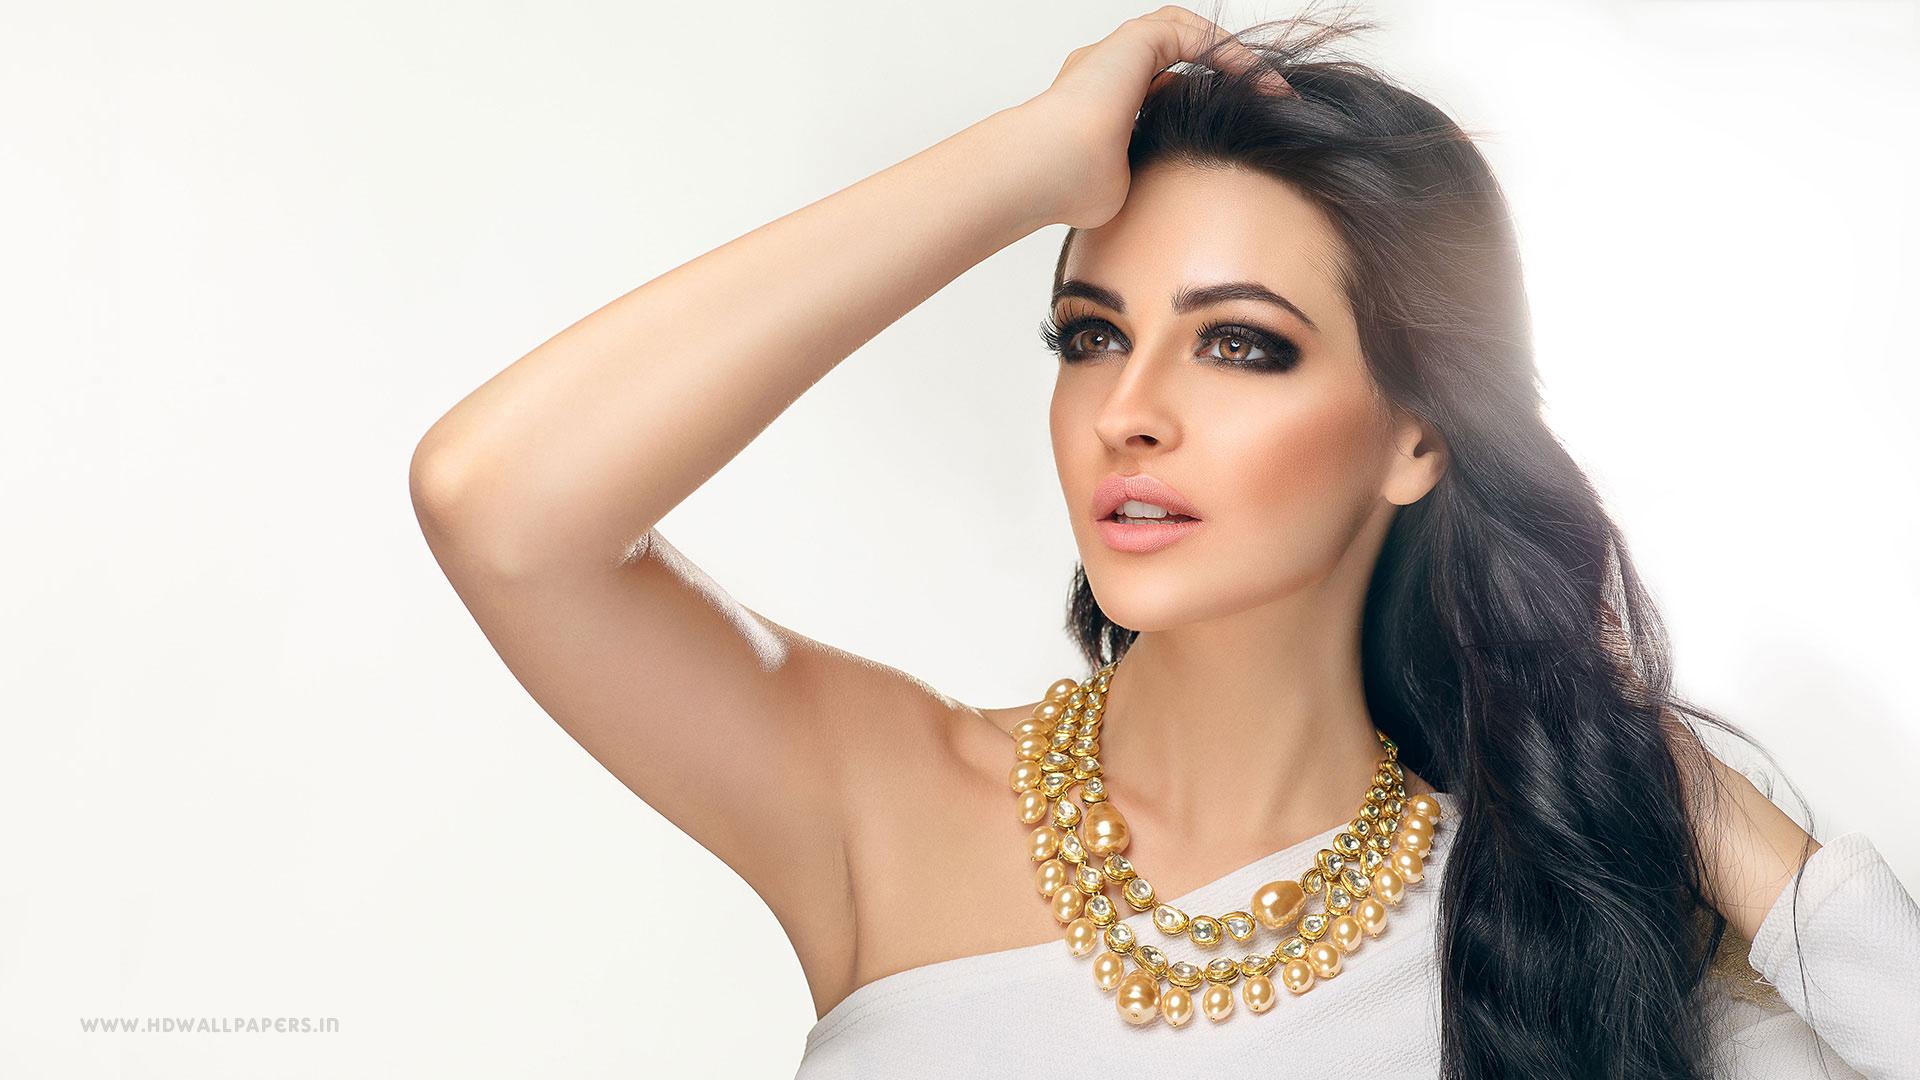 Beautiful Makeup Models Hd 1920x1080 Download Hd Wallpaper Wallpapertip